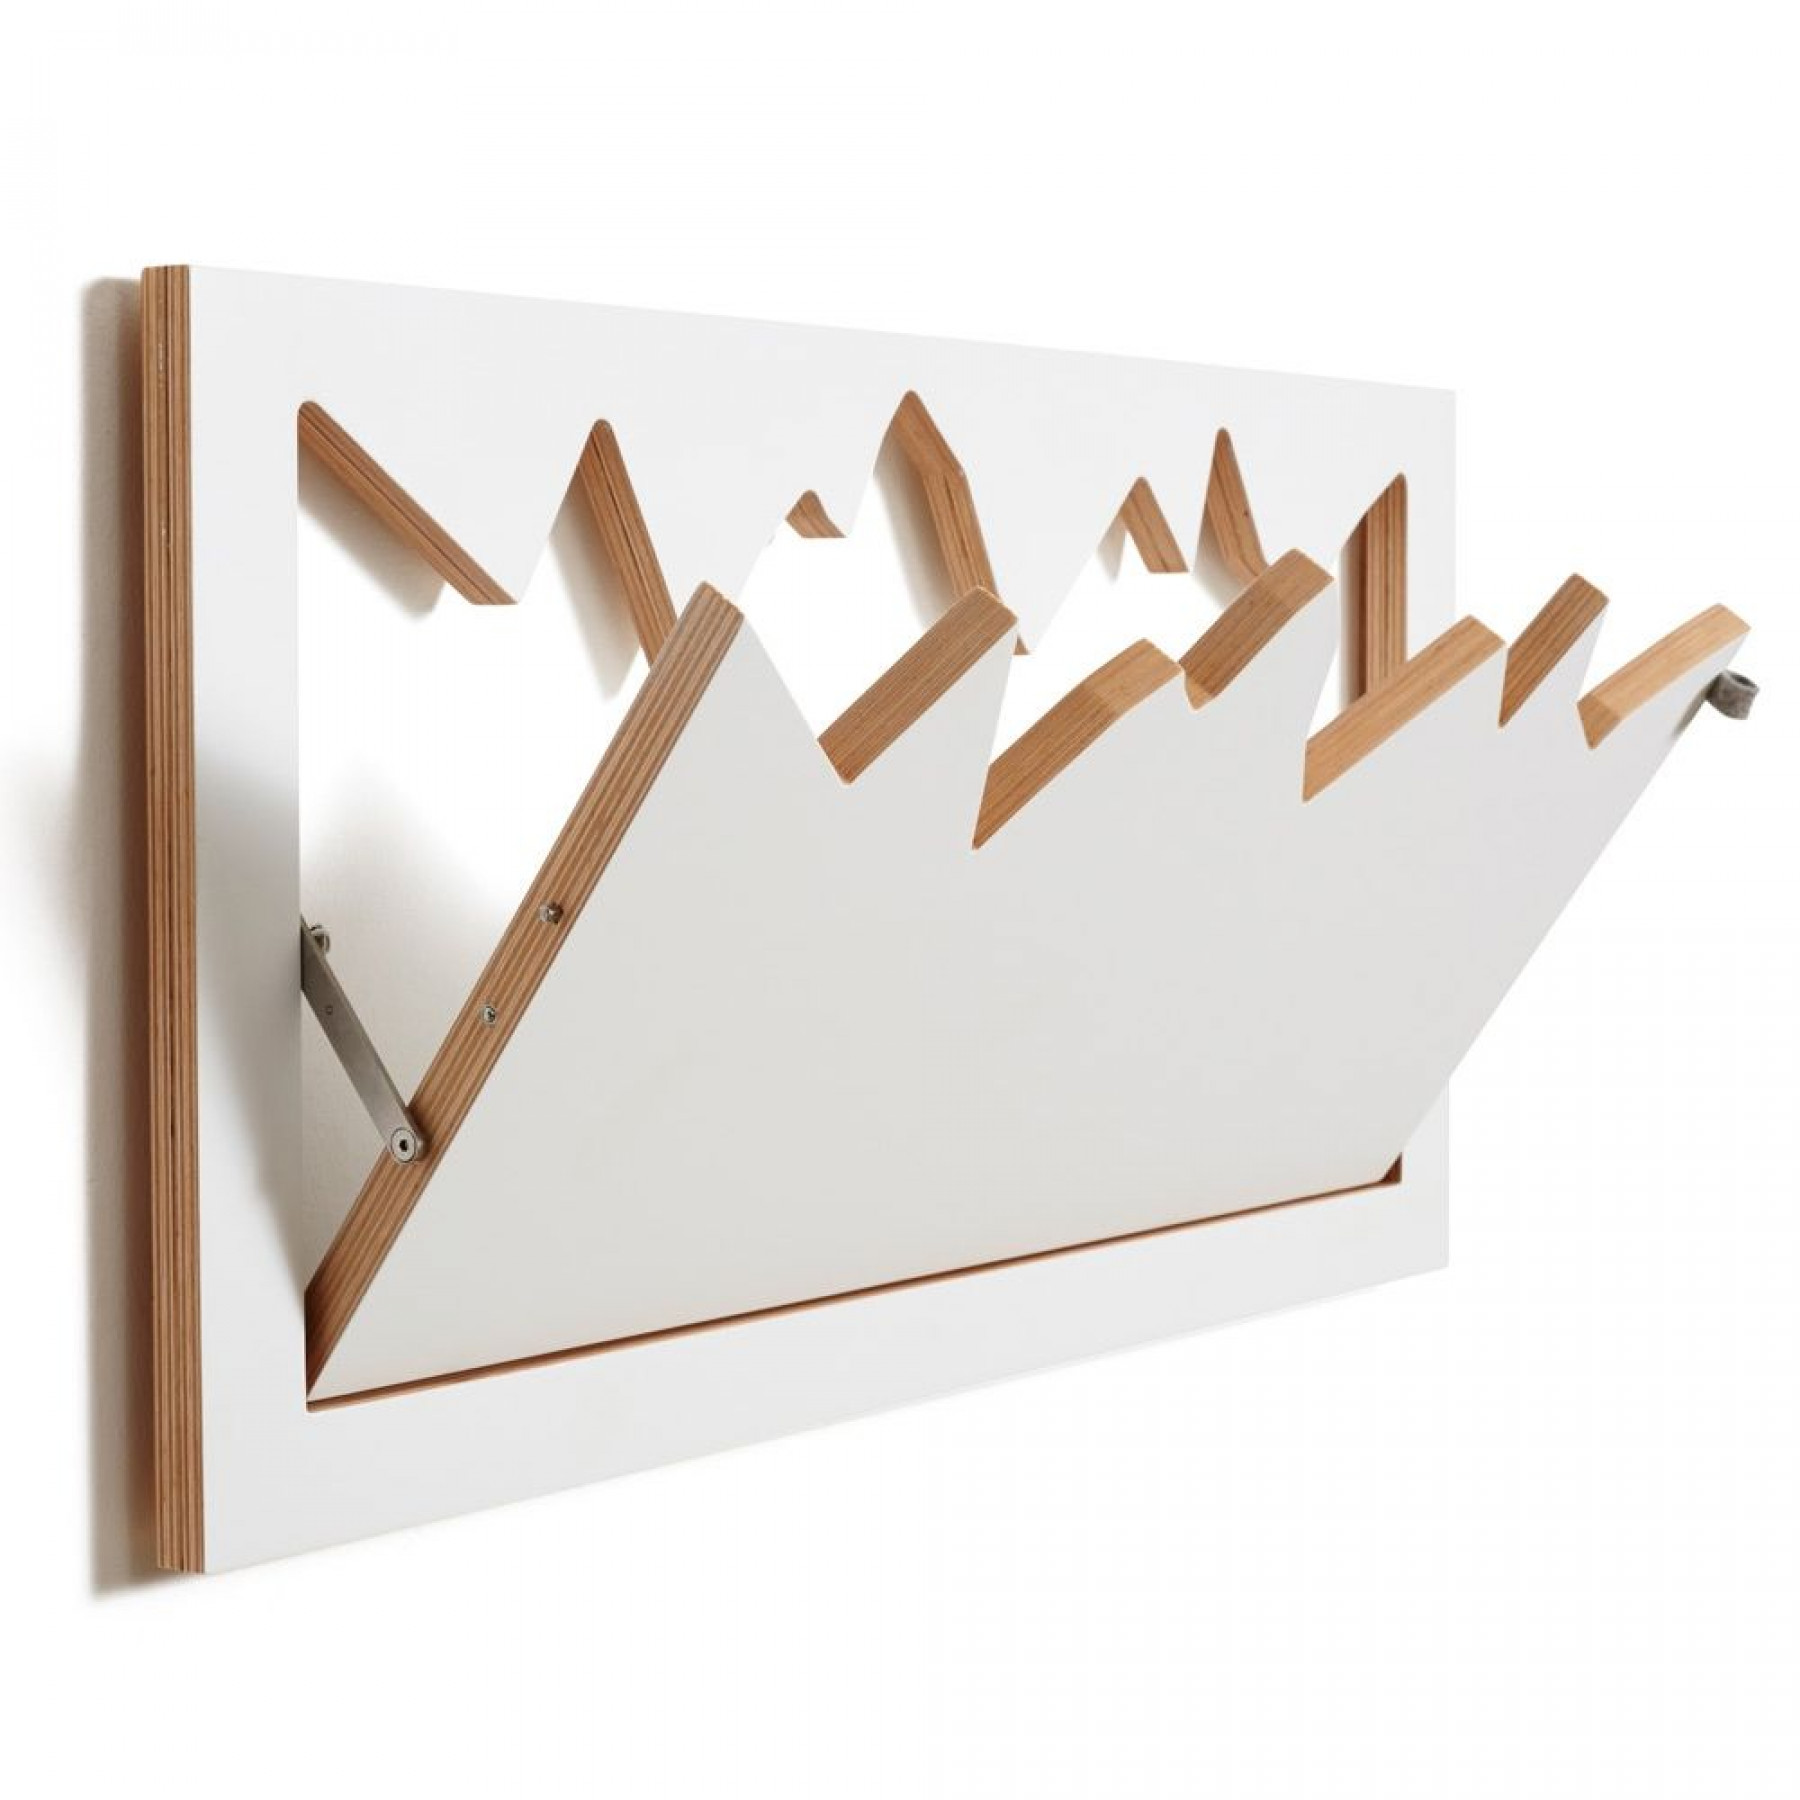 Coatrack Fläpps | White